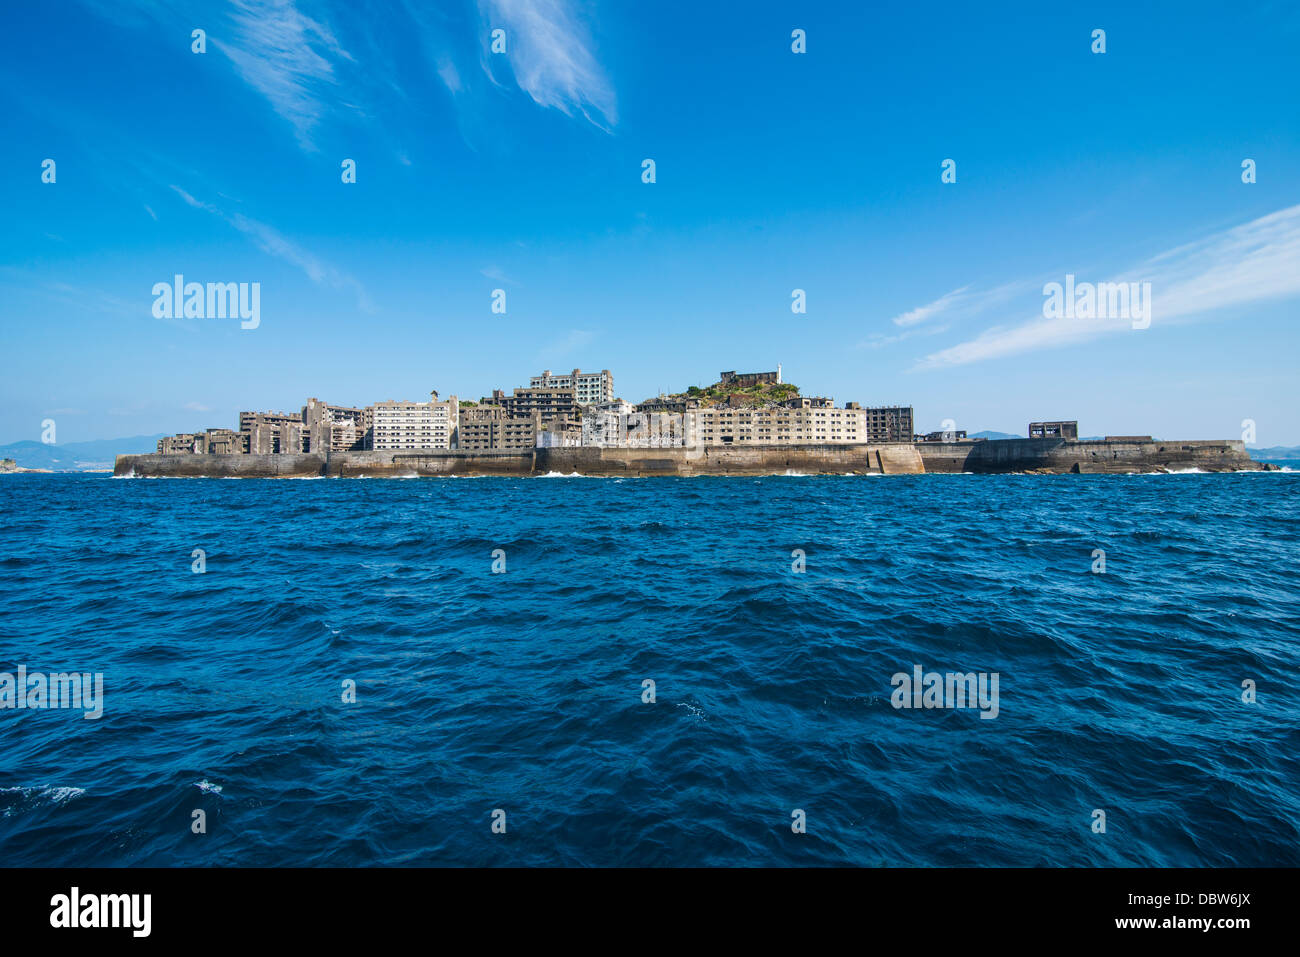 Hashima Island Gunkanjima (Warship Island), Nagasaki, Kyushu, Japan, Asia - Stock Image